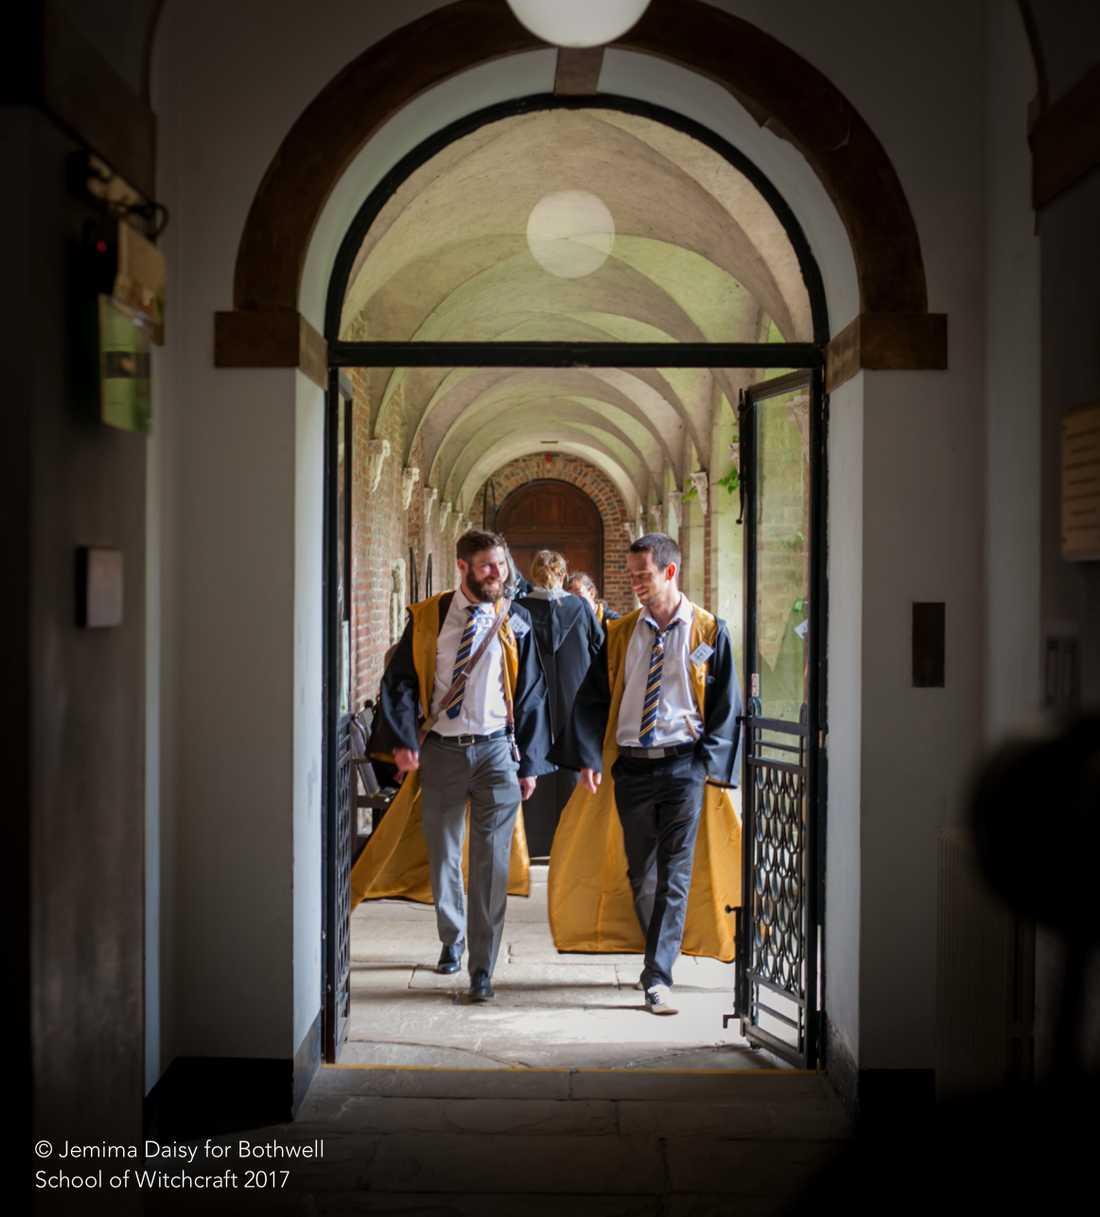 Skolpojkar i korridoren.